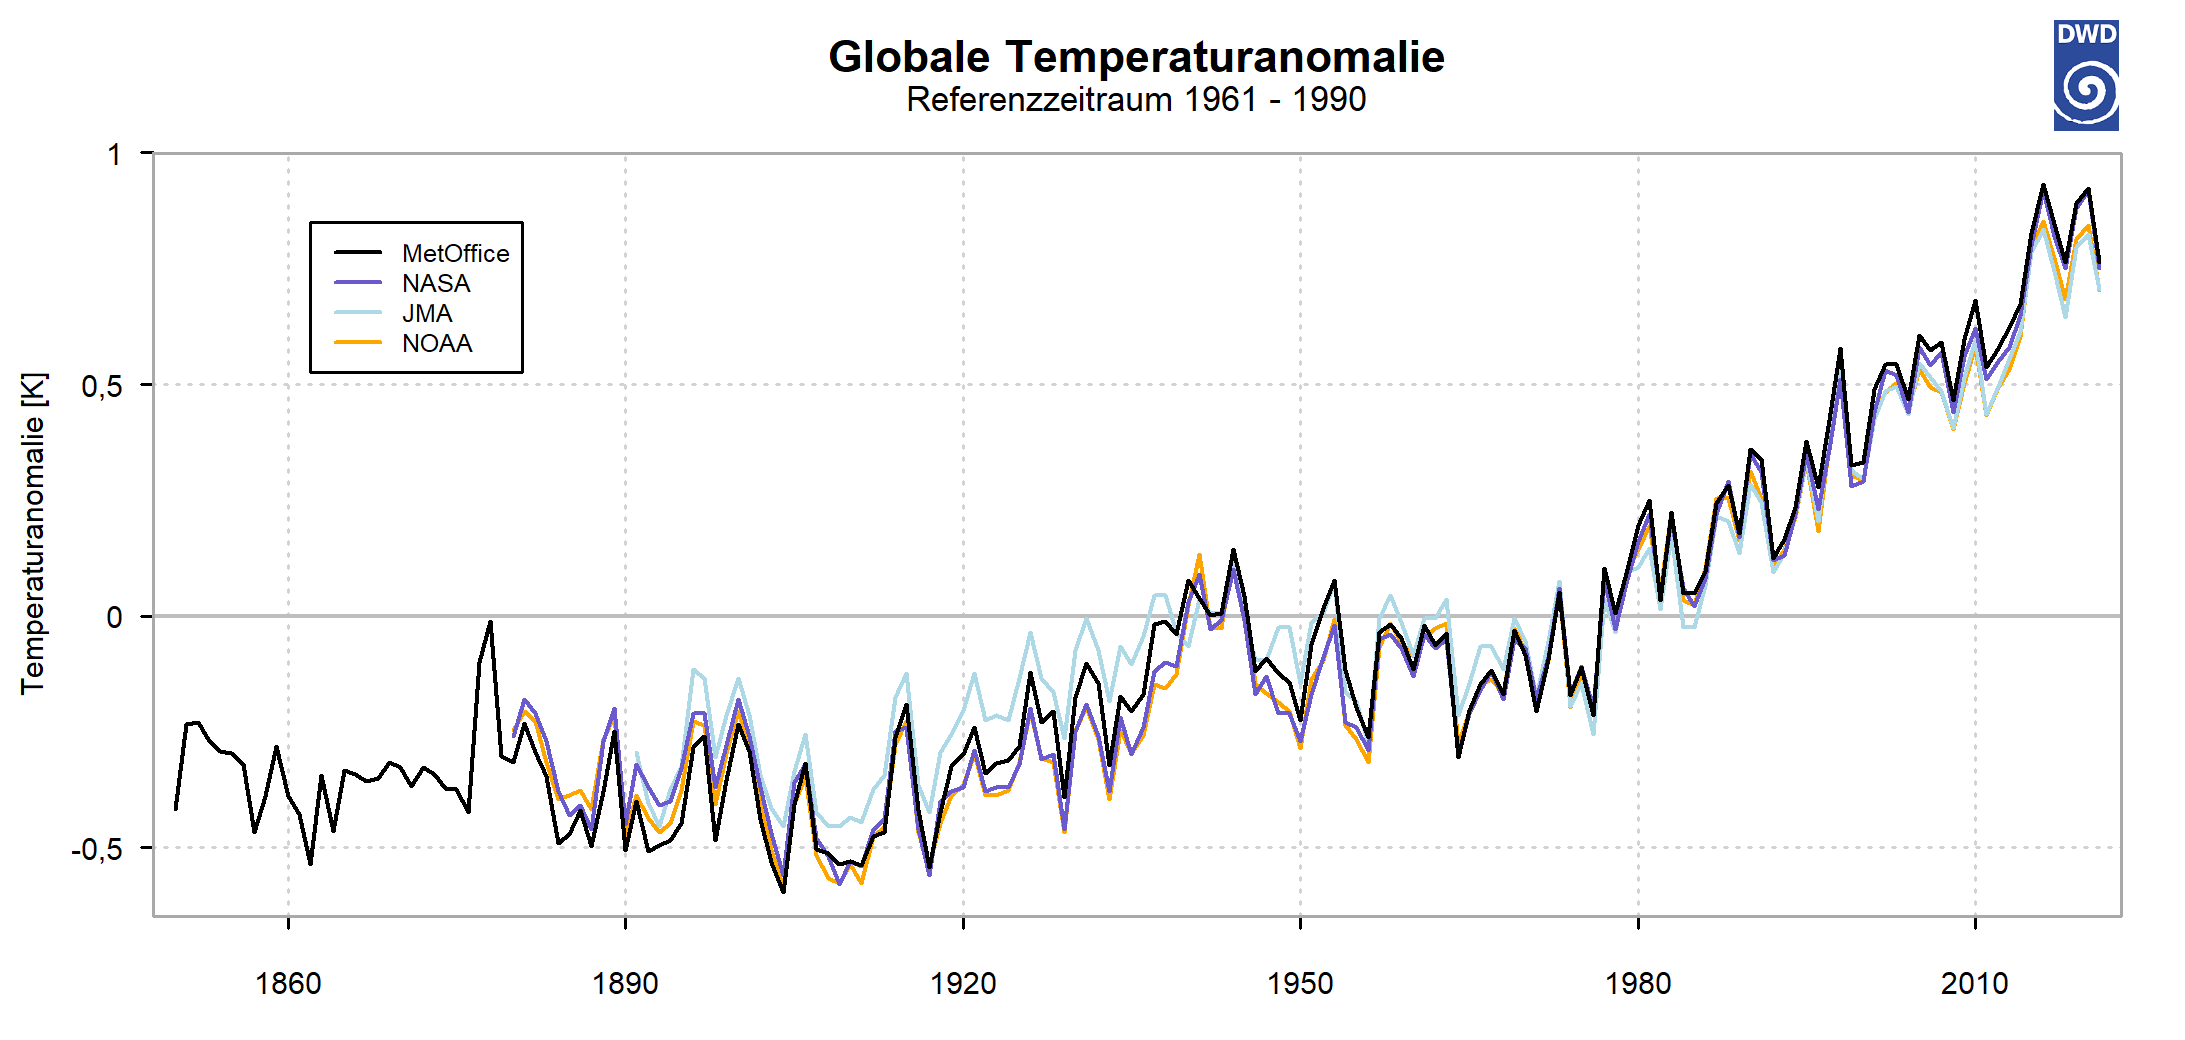 Globale Temperaturabweichung (Quelle DWD)